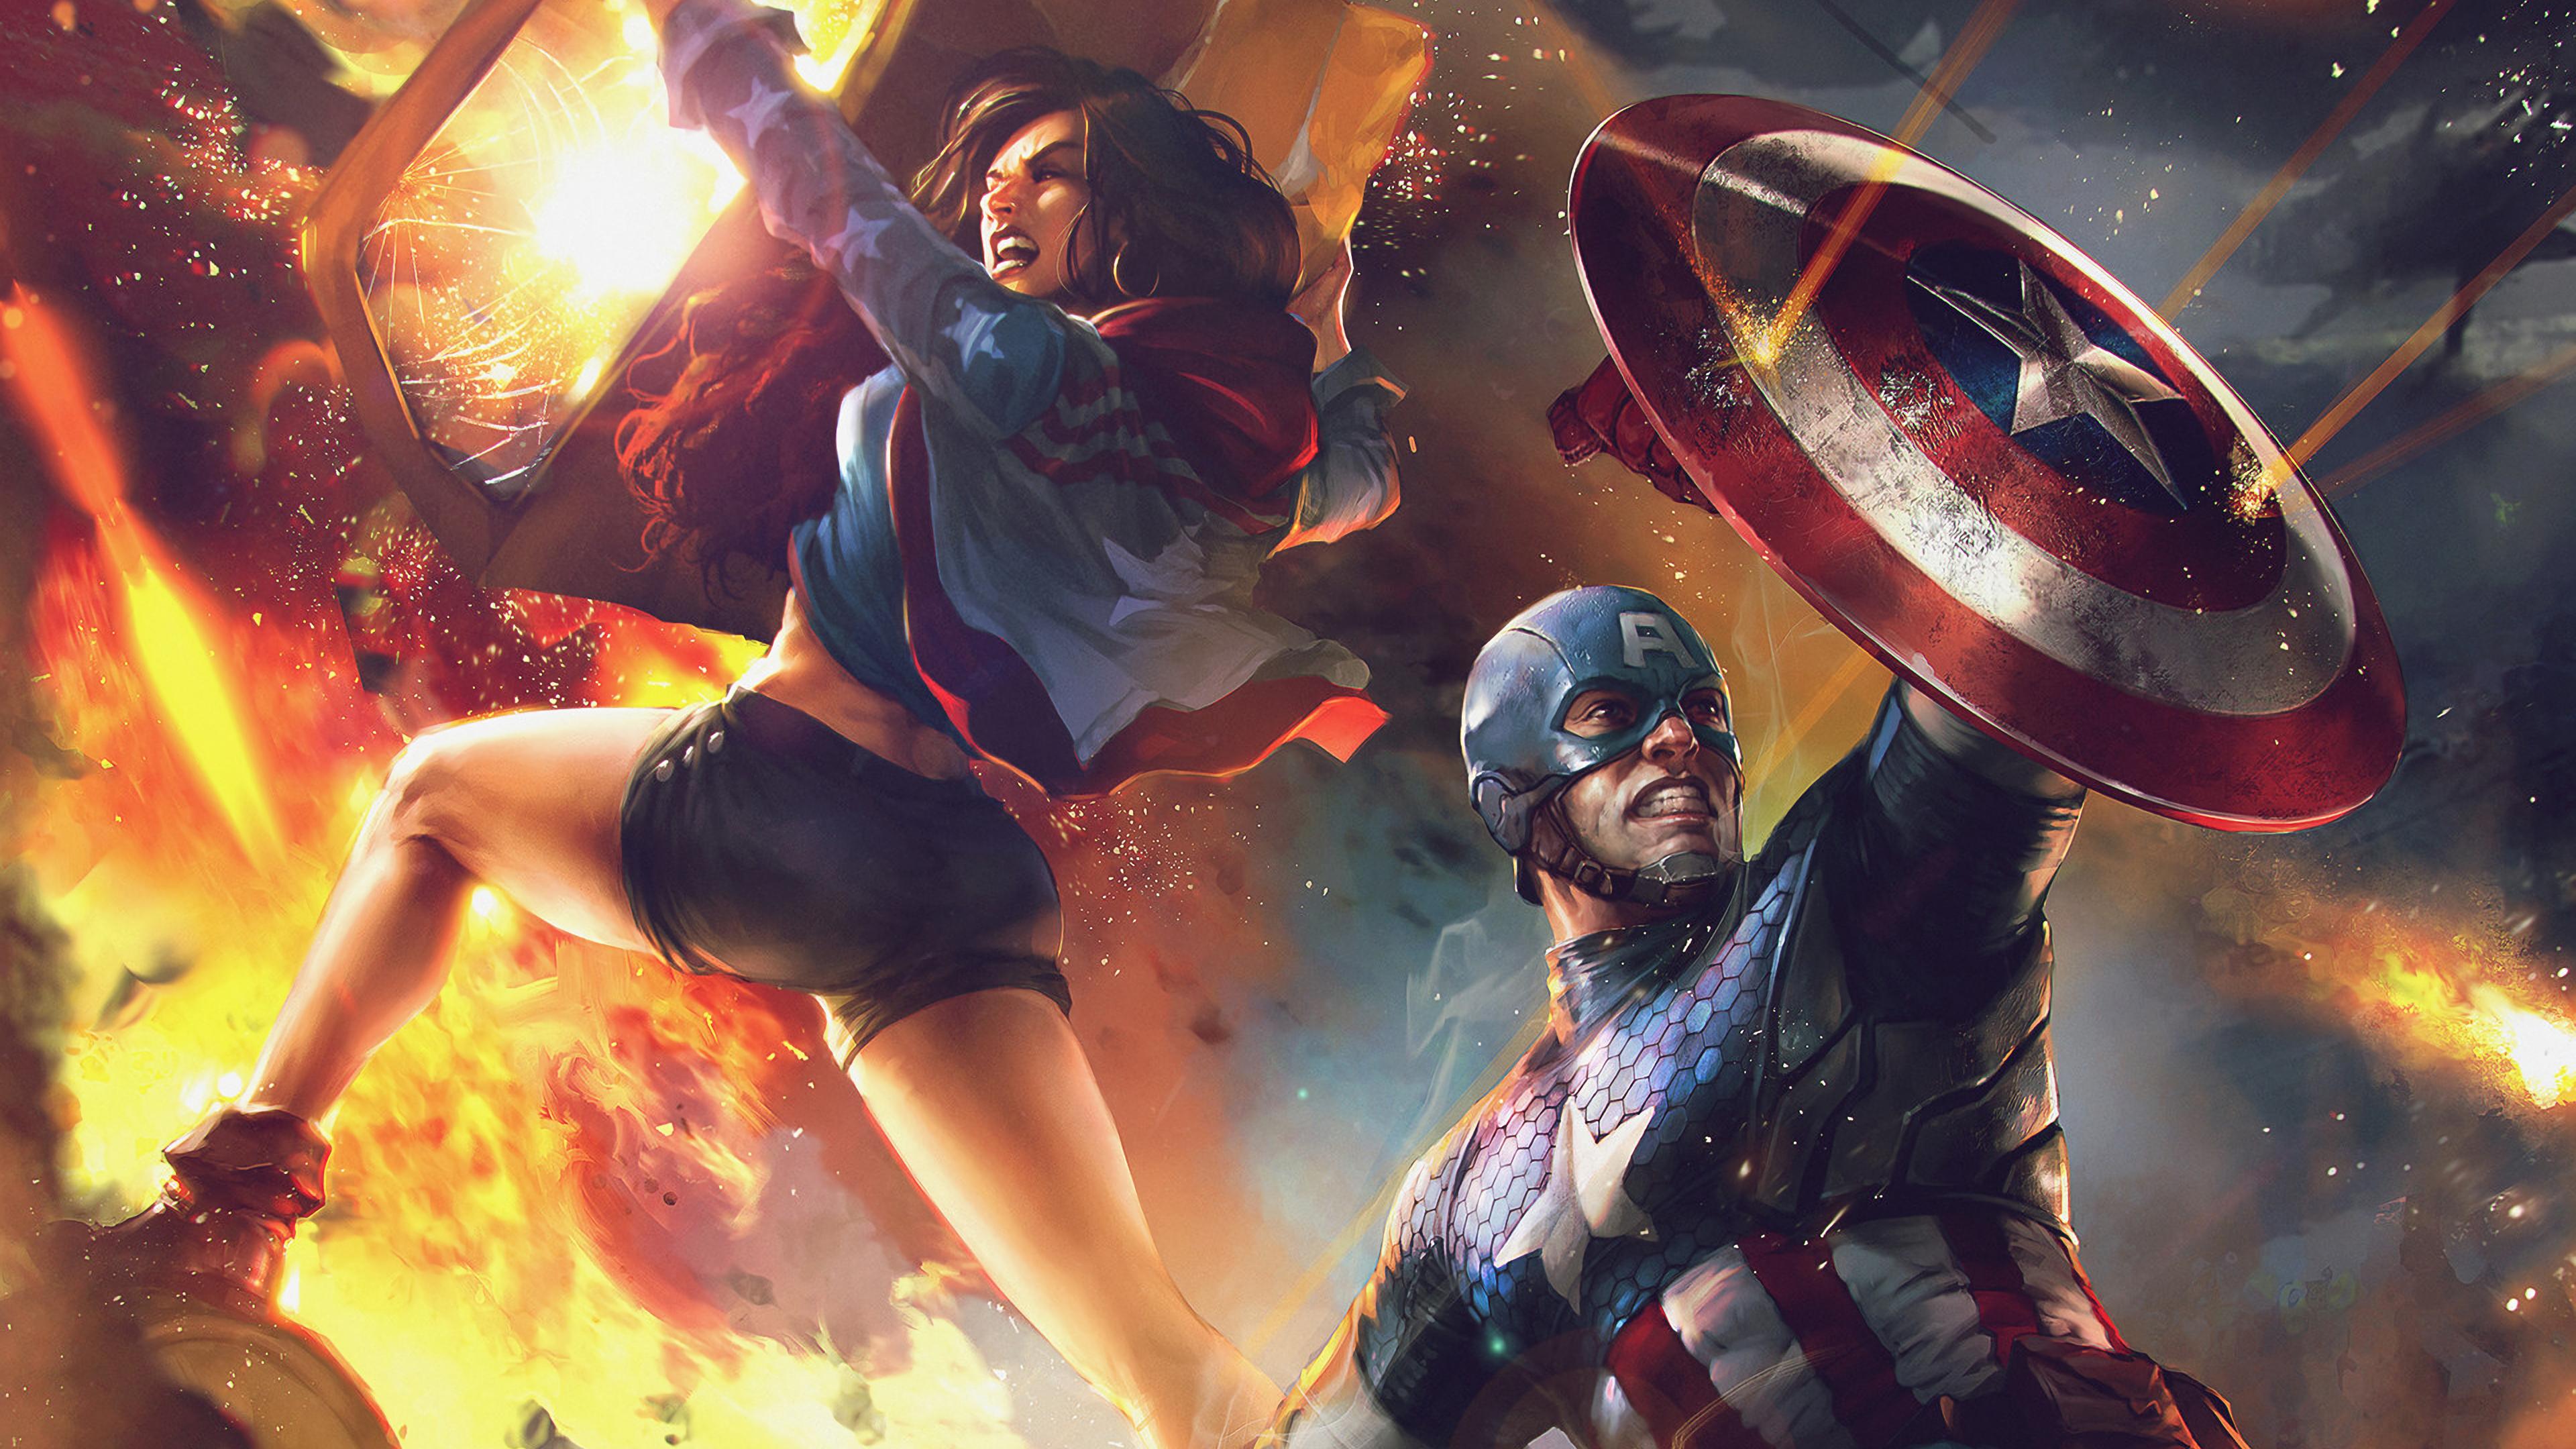 captain america and miss america 1570394733 - Captain America And Miss America - superheroes wallpapers, miss america wallpapers, hd-wallpapers, digital art wallpapers, captain america wallpapers, artwork wallpapers, artstation wallpapers, artist wallpapers, 4k-wallpapers